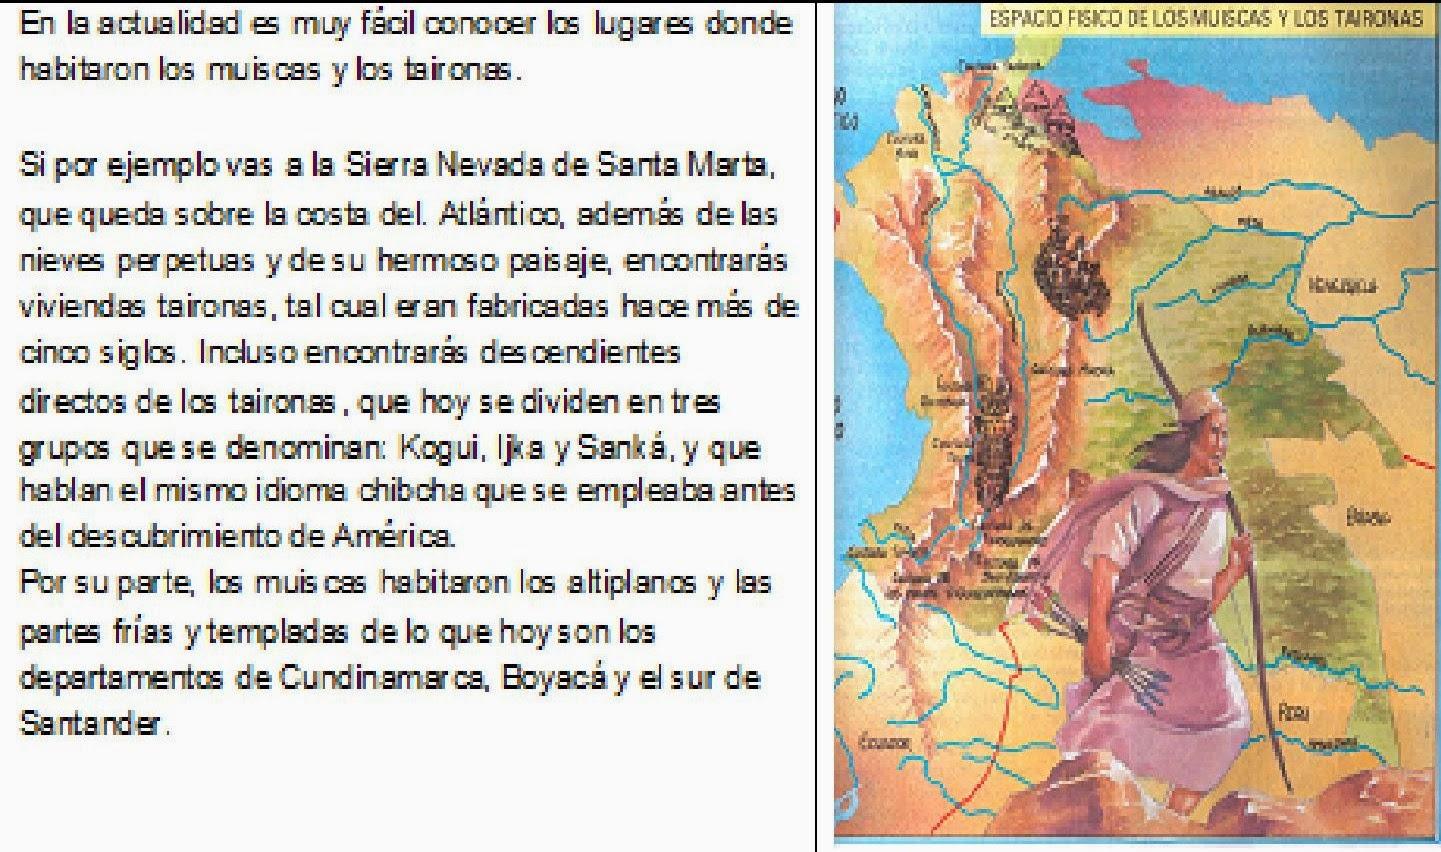 Cultura Los Chibchas Cultura Chibcha Muiscas y